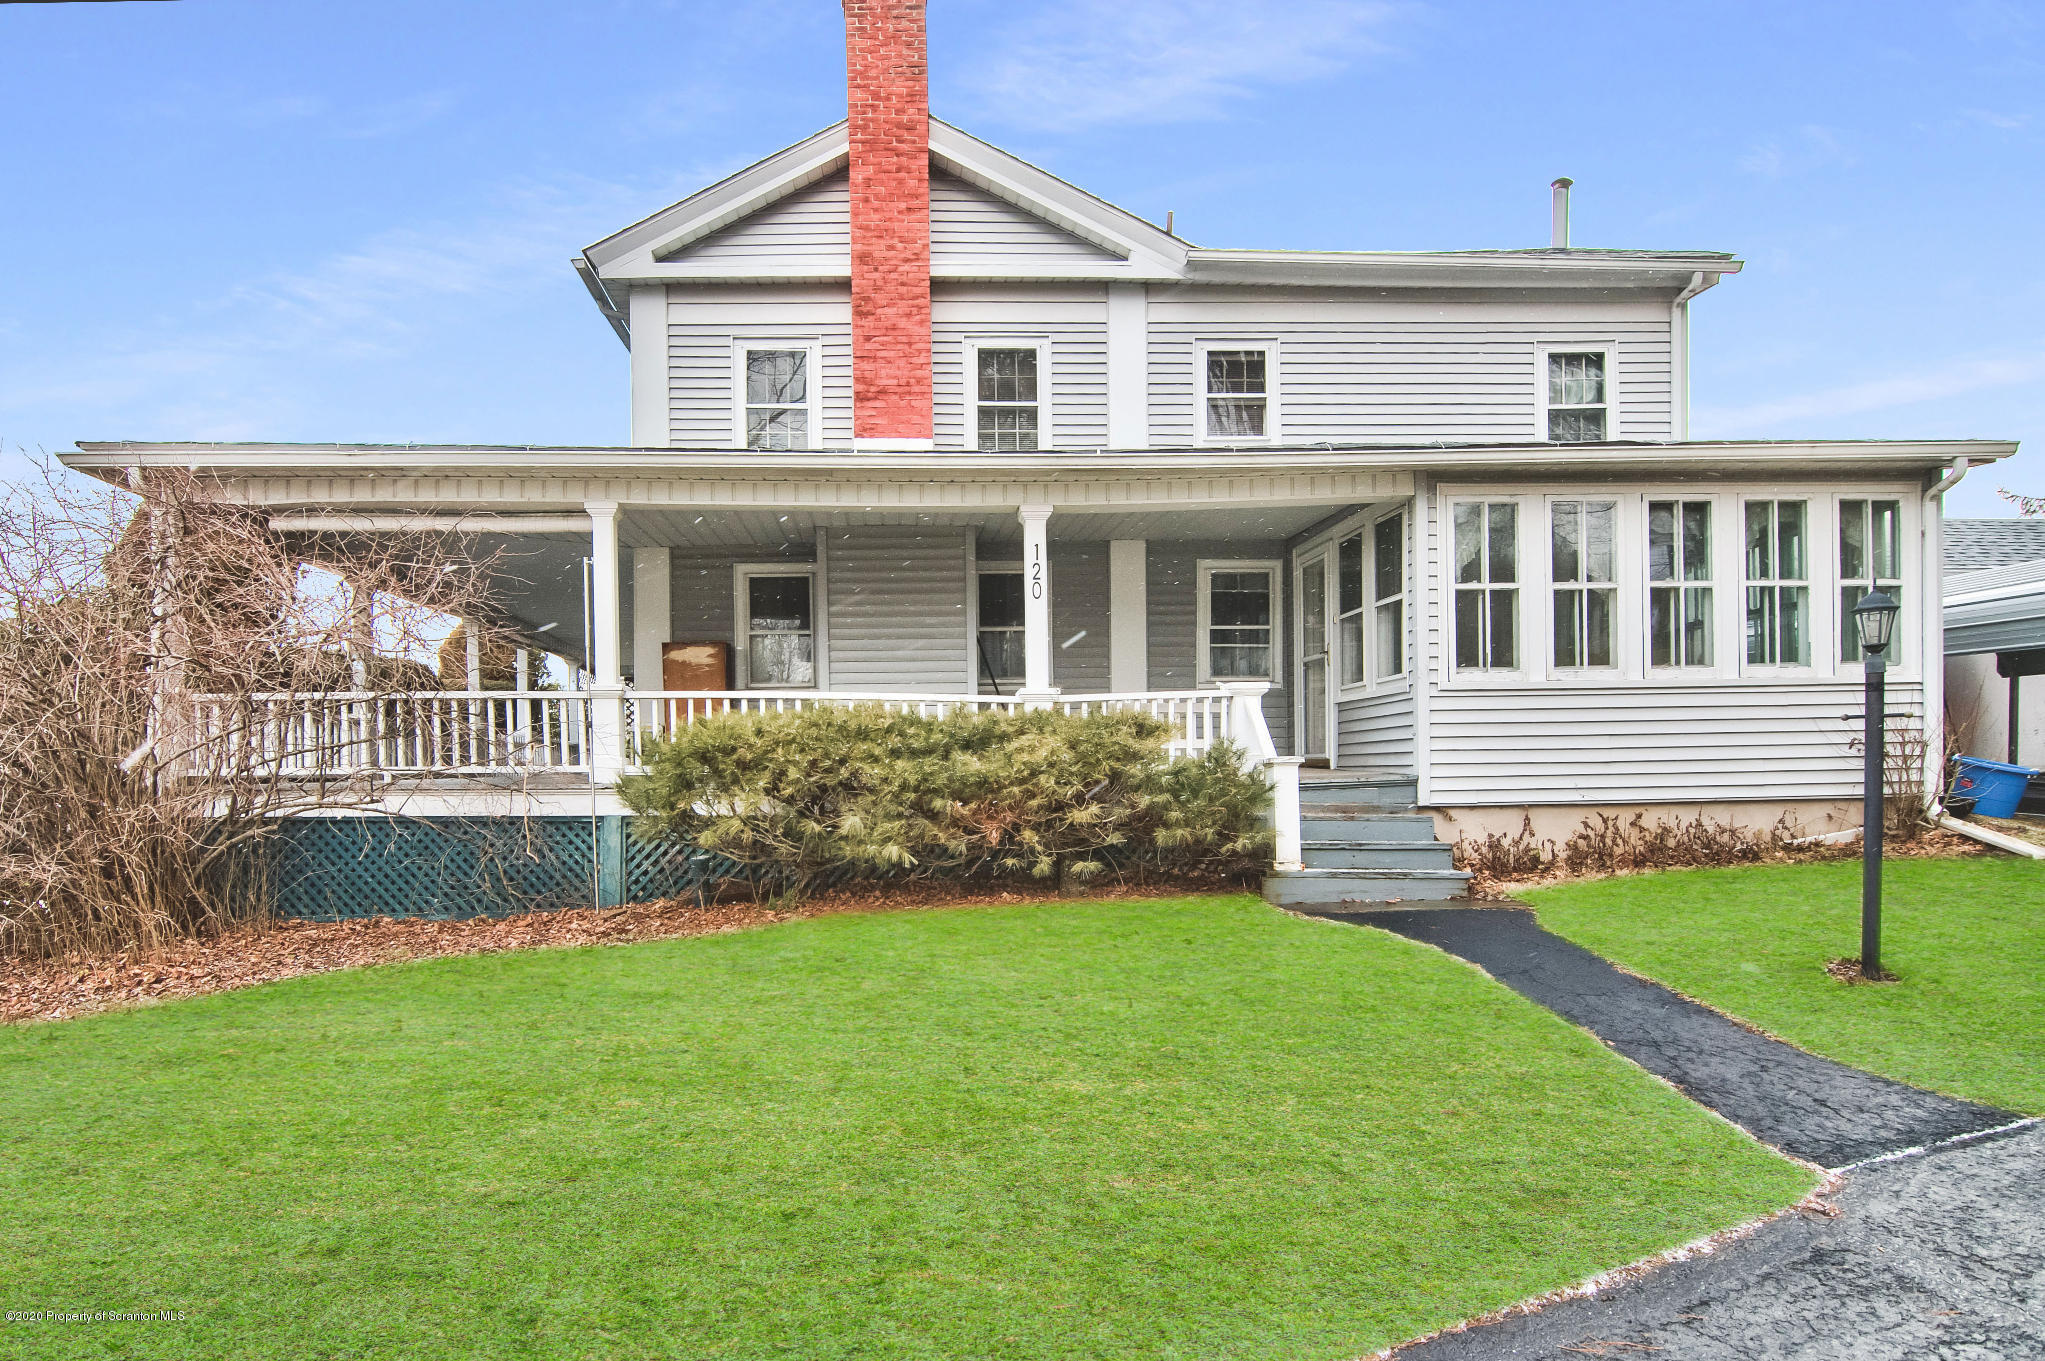 120 Turnpike Rd, Dalton, Pennsylvania 18414, 4 Bedrooms Bedrooms, 8 Rooms Rooms,2 BathroomsBathrooms,Single Family,For Sale,Turnpike,20-270